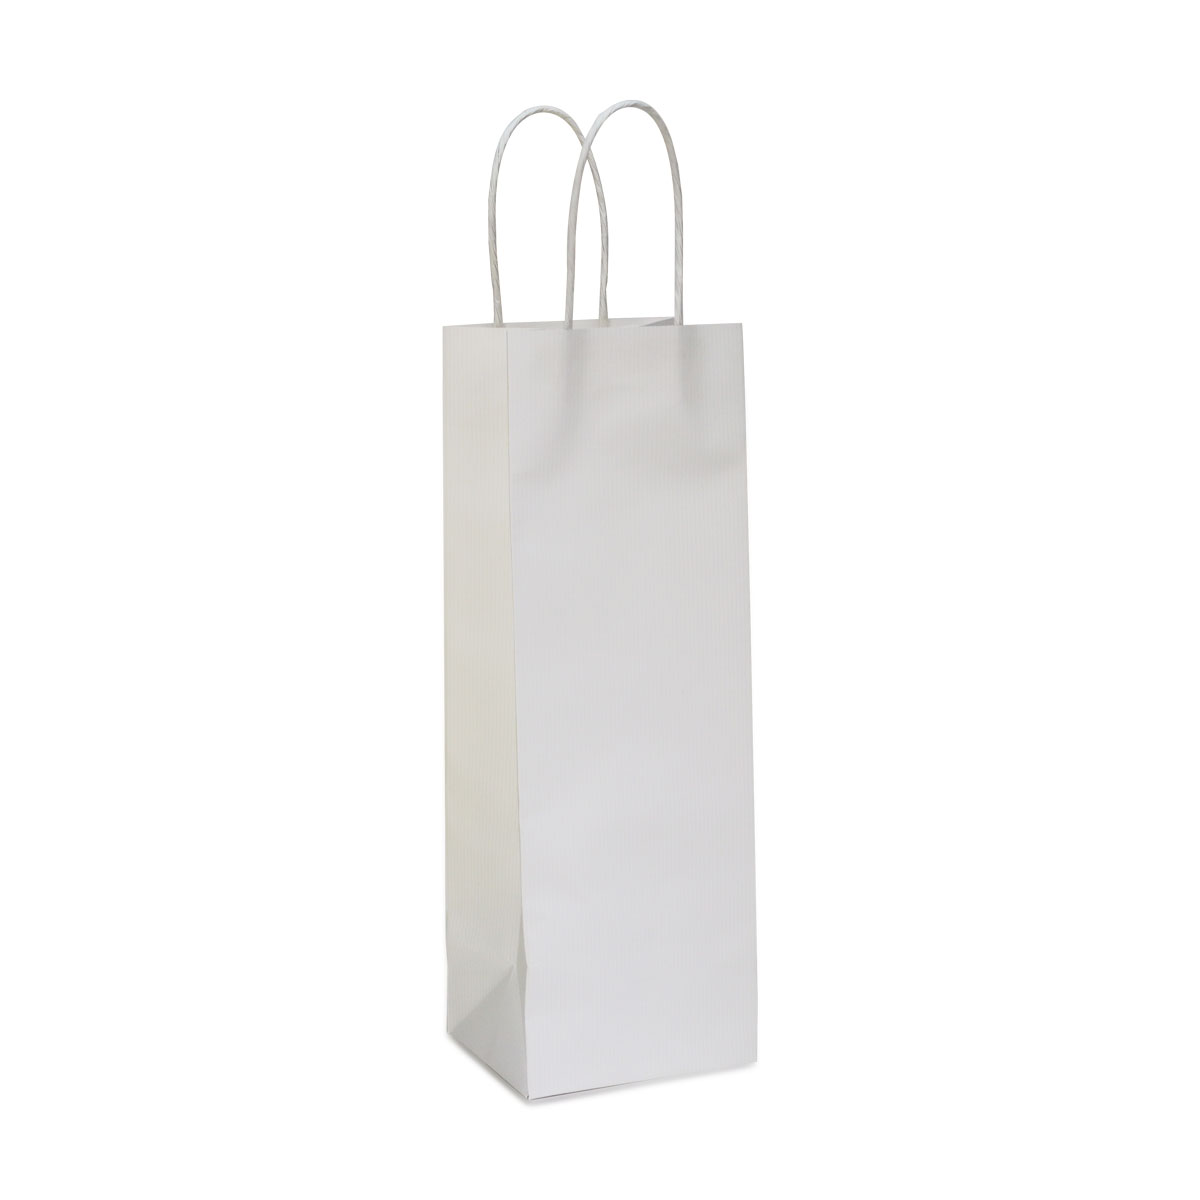 papierenwijnflestassen-twisted-wit-product